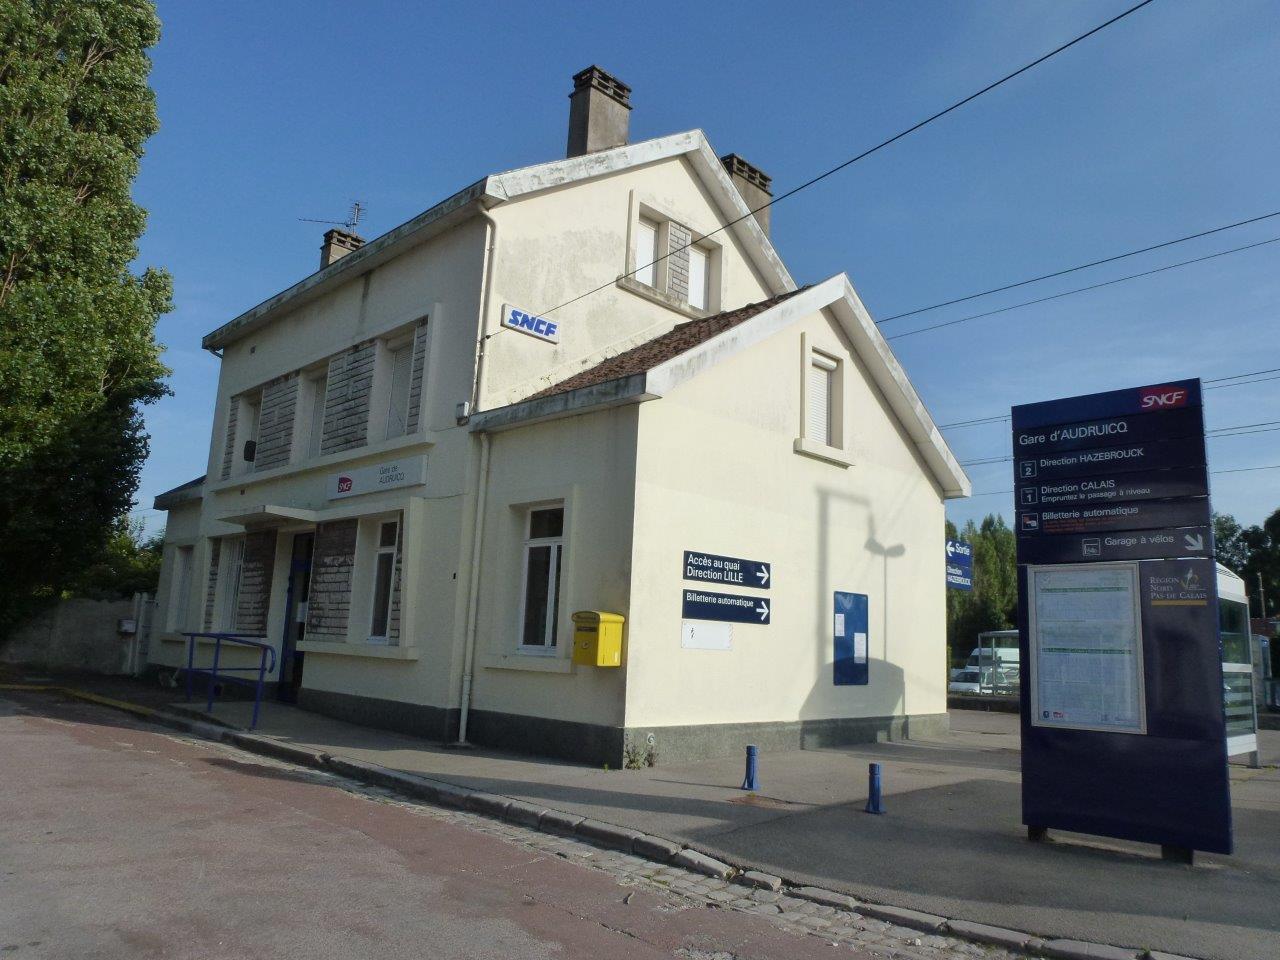 gare-d-audruicq-train-station